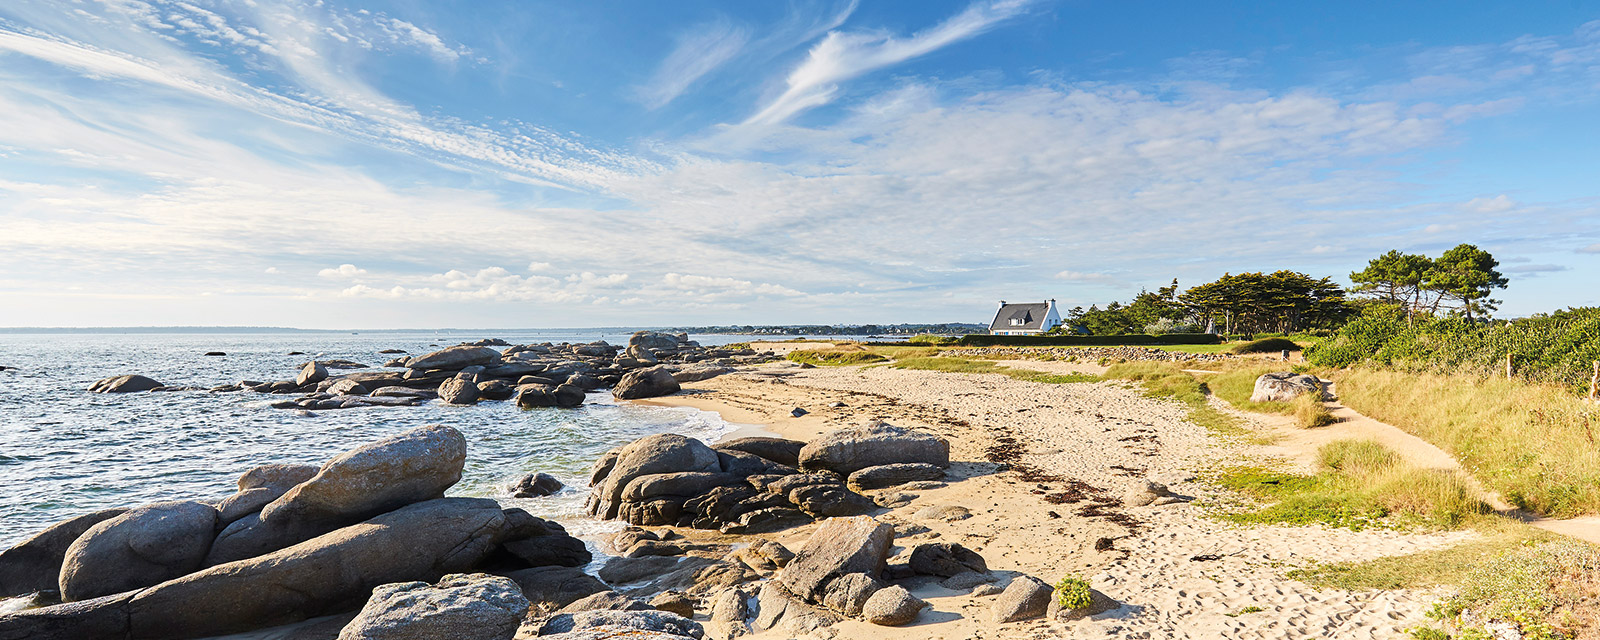 Rocky beach of the Pointe de la jument